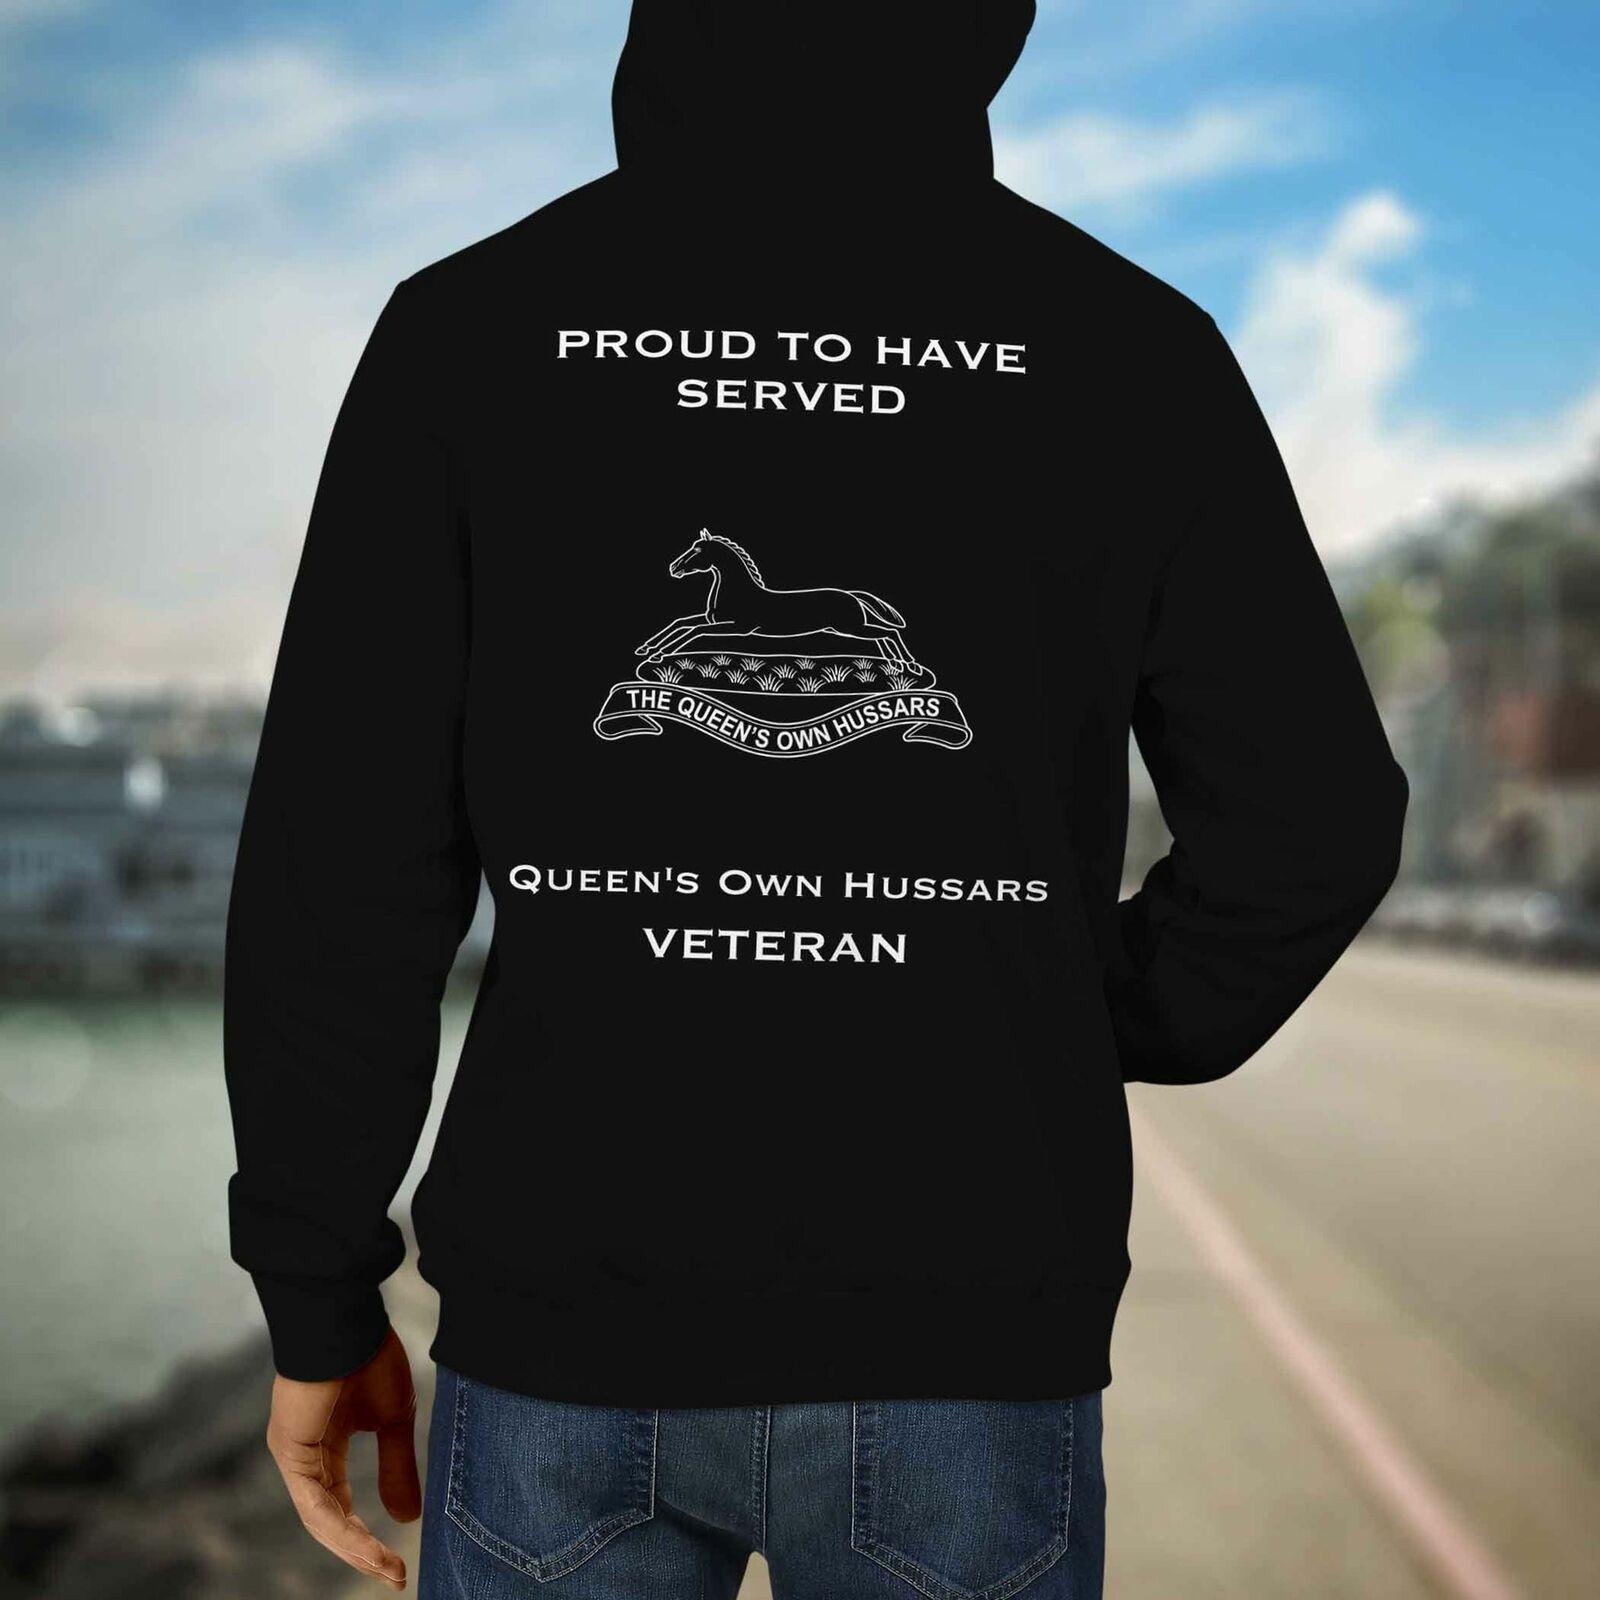 Queens Own Hussars Premium Veteran Hoodie (123)